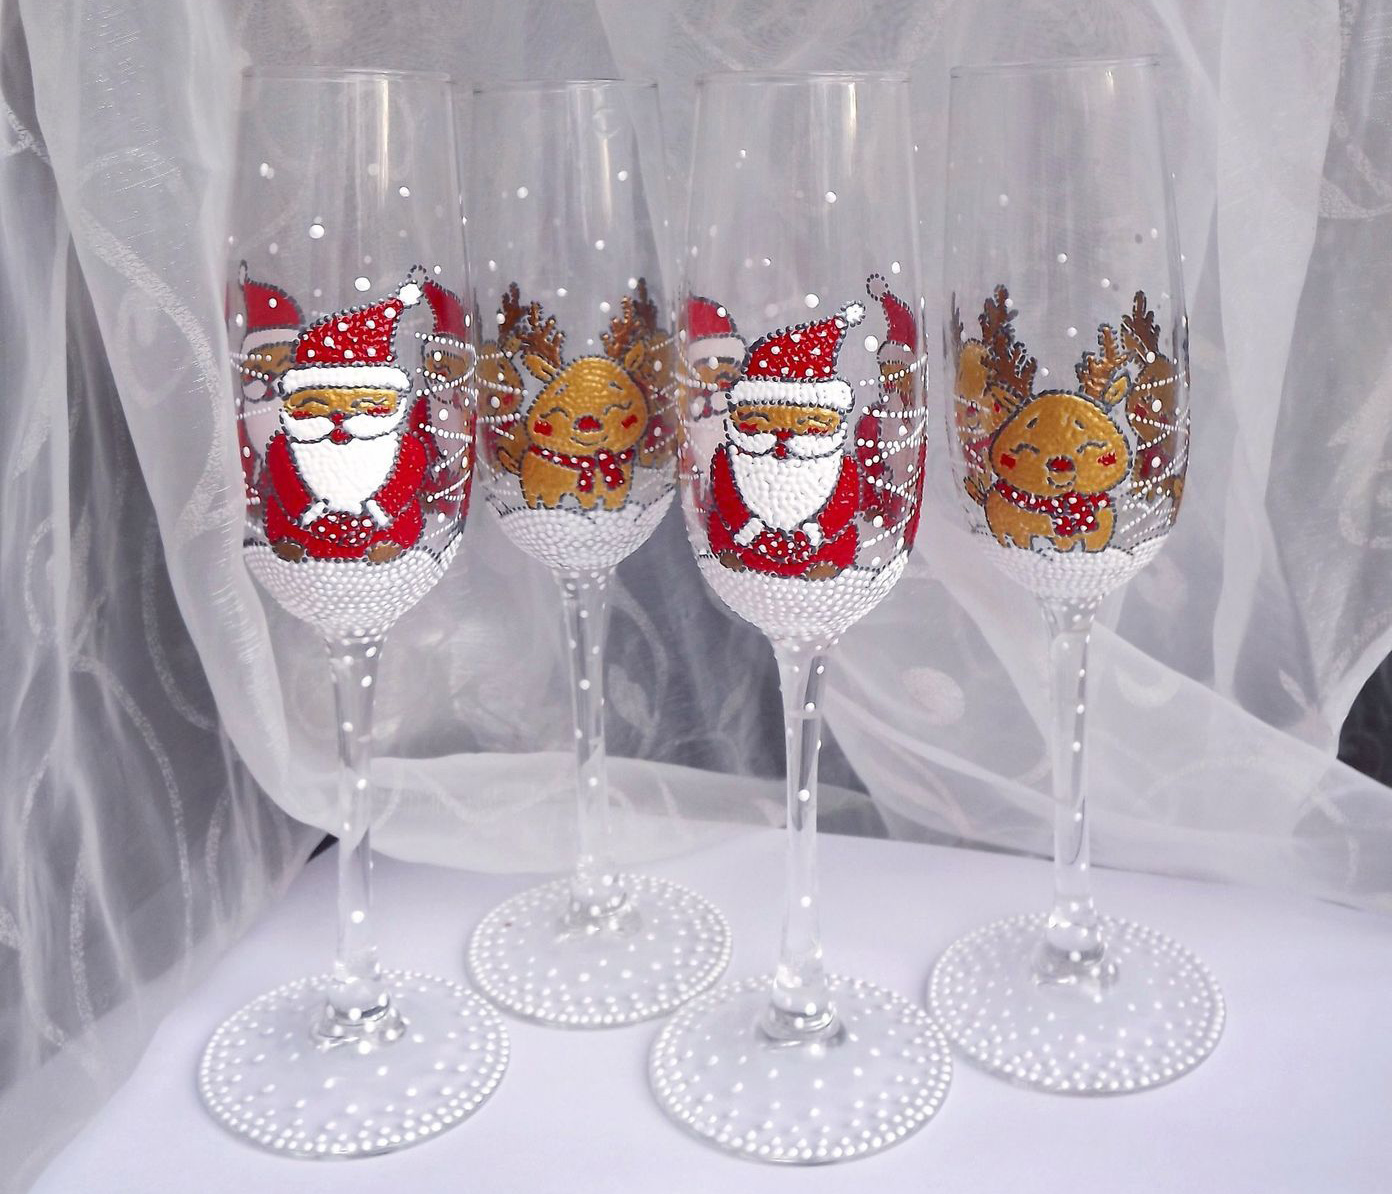 бокалы с новогодним декором